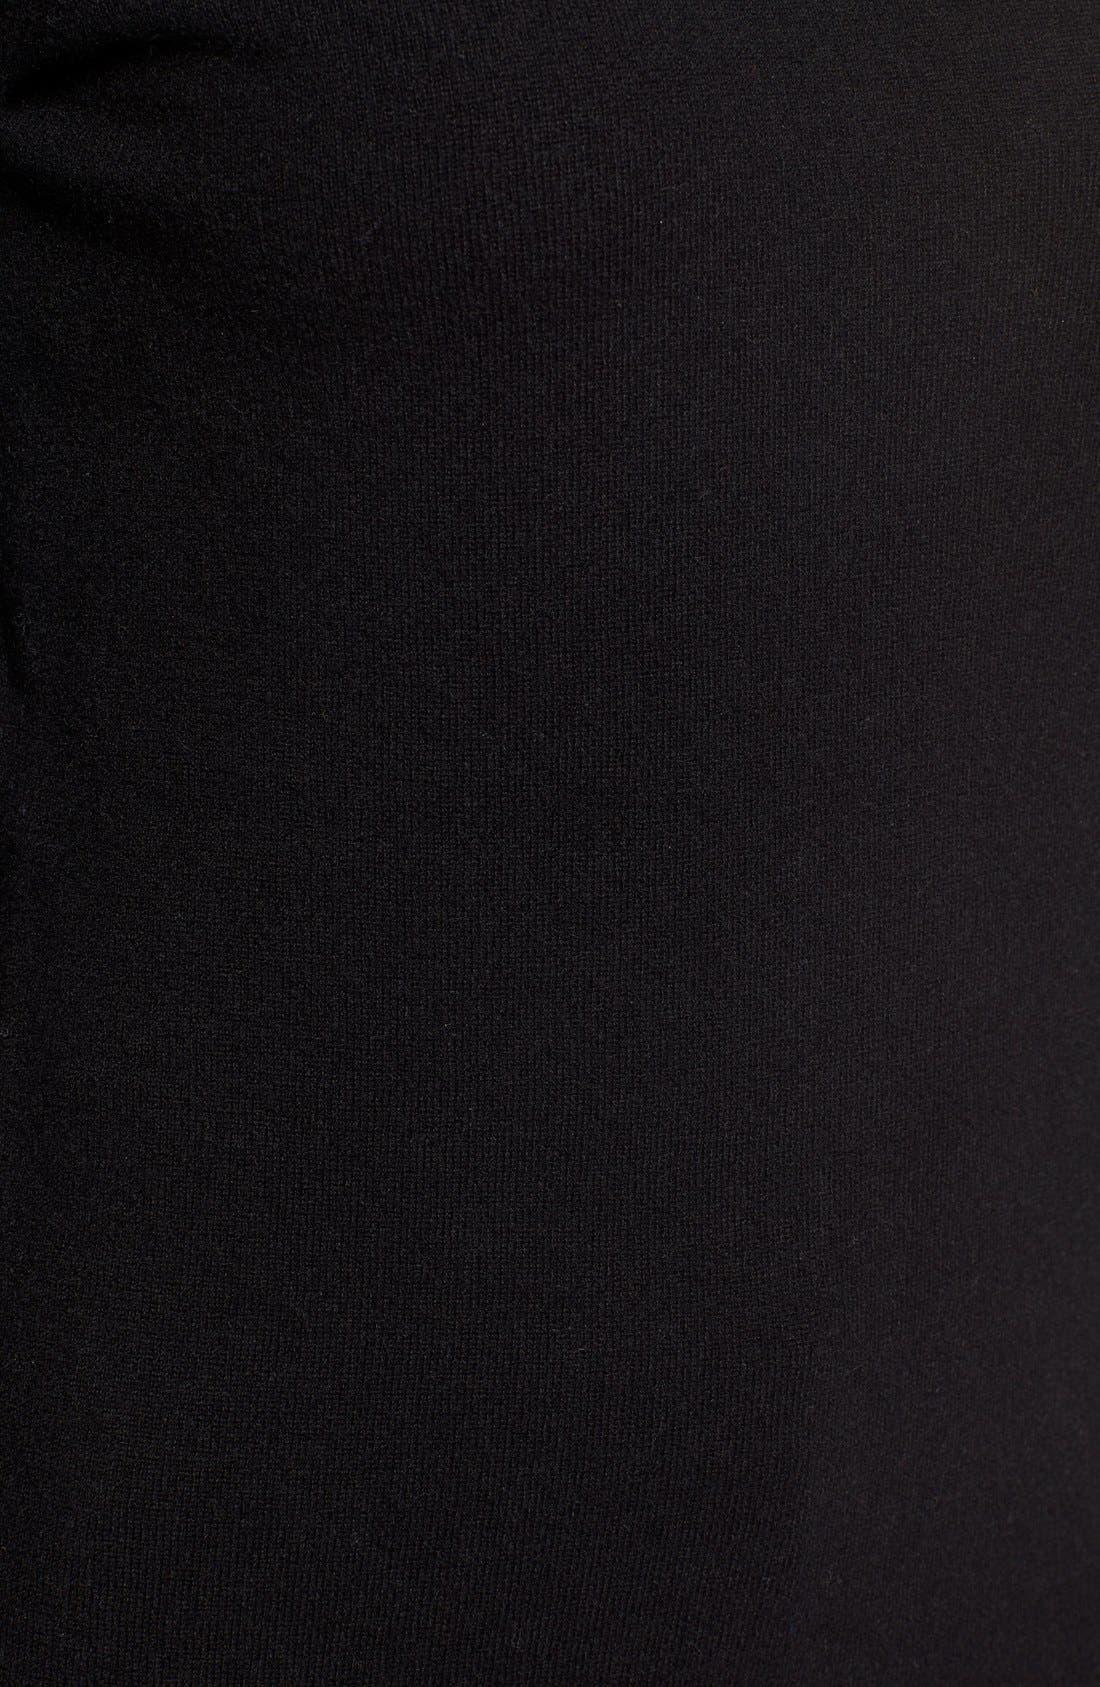 NORDSTROM COLLECTION,                             Cashmere Turtleneck Sweater,                             Alternate thumbnail 5, color,                             001